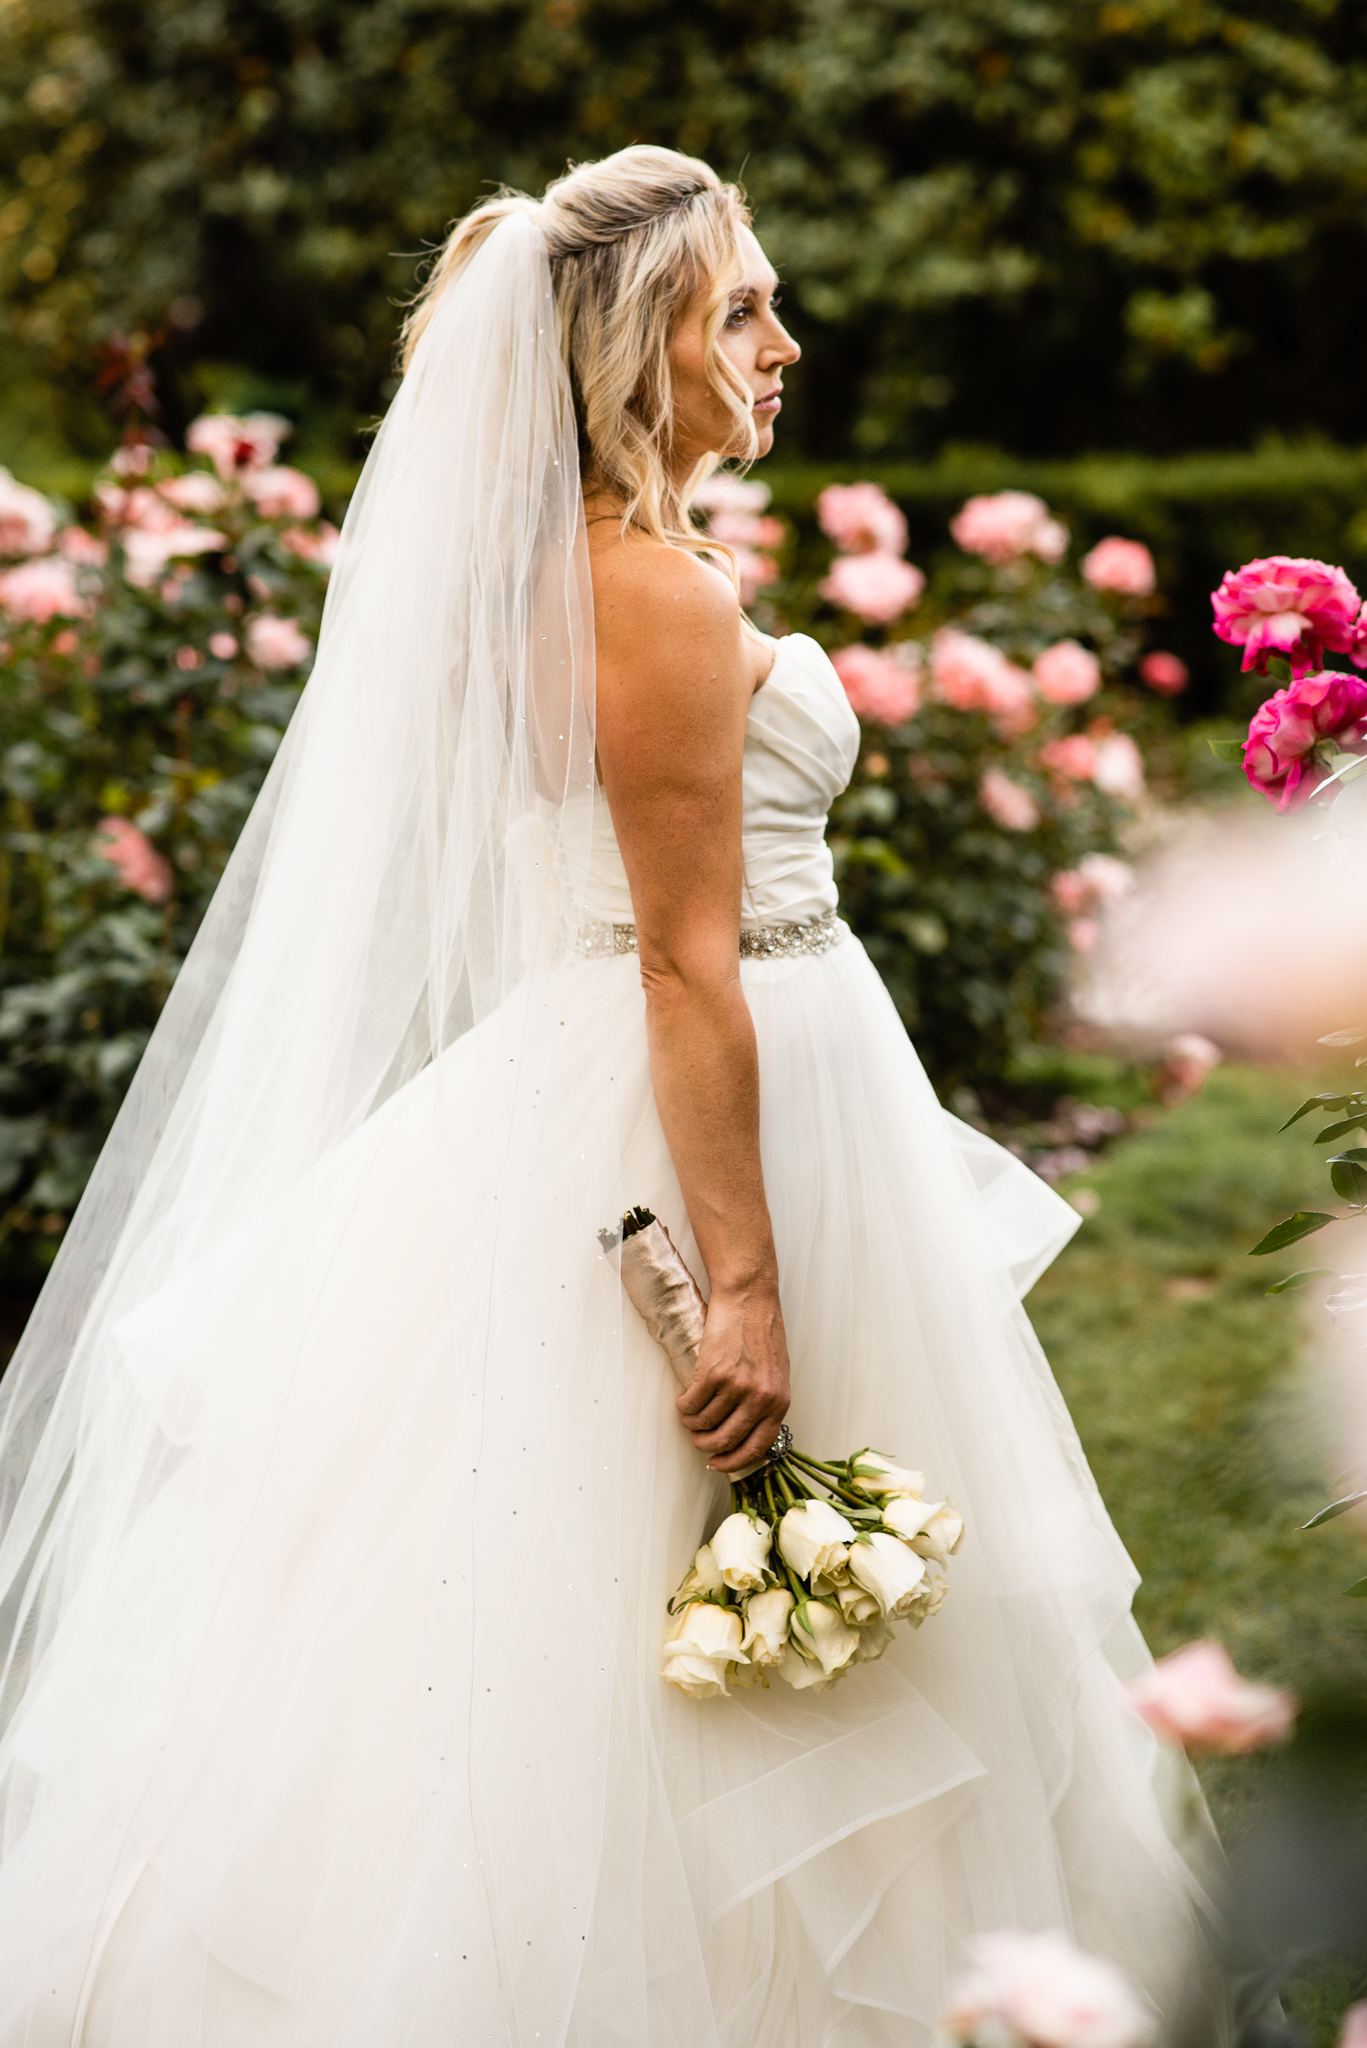 Megan & Keith - Wedding - Portland OR - Malina Rose Photography-9.jpg